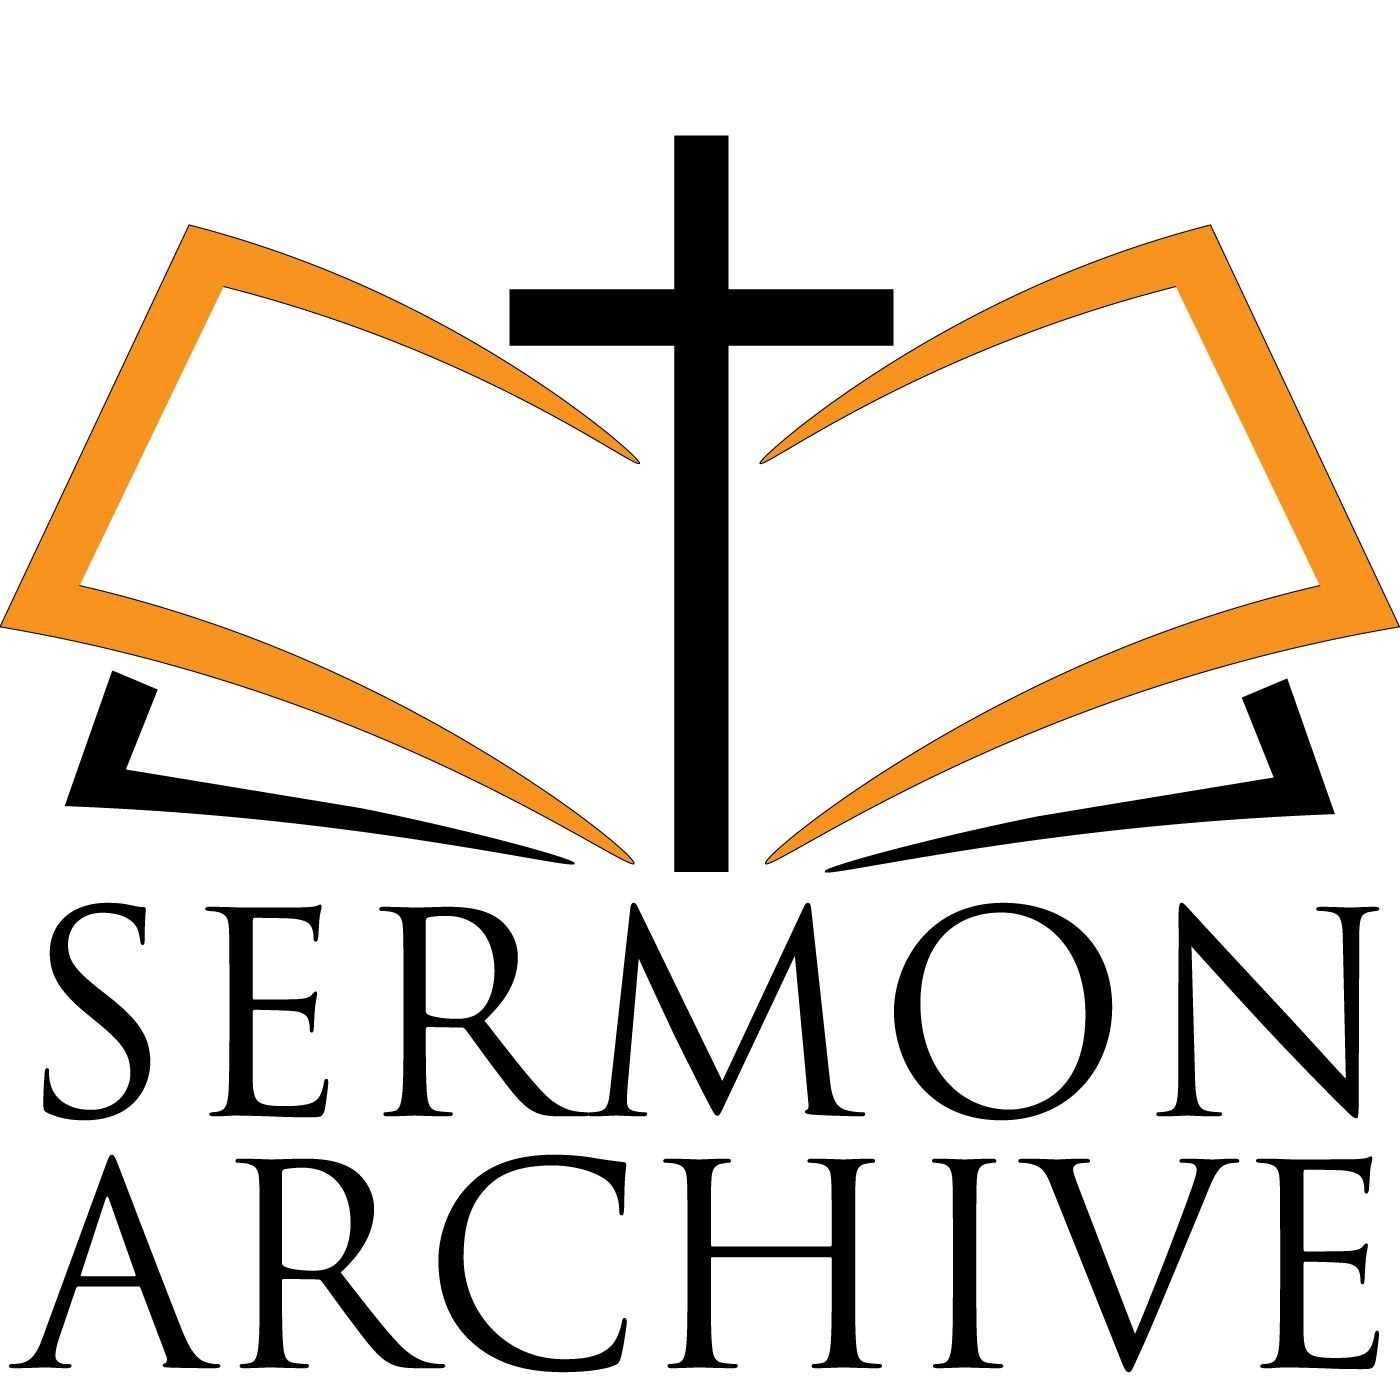 Communion Service - Dr. White - PM July 14 2019